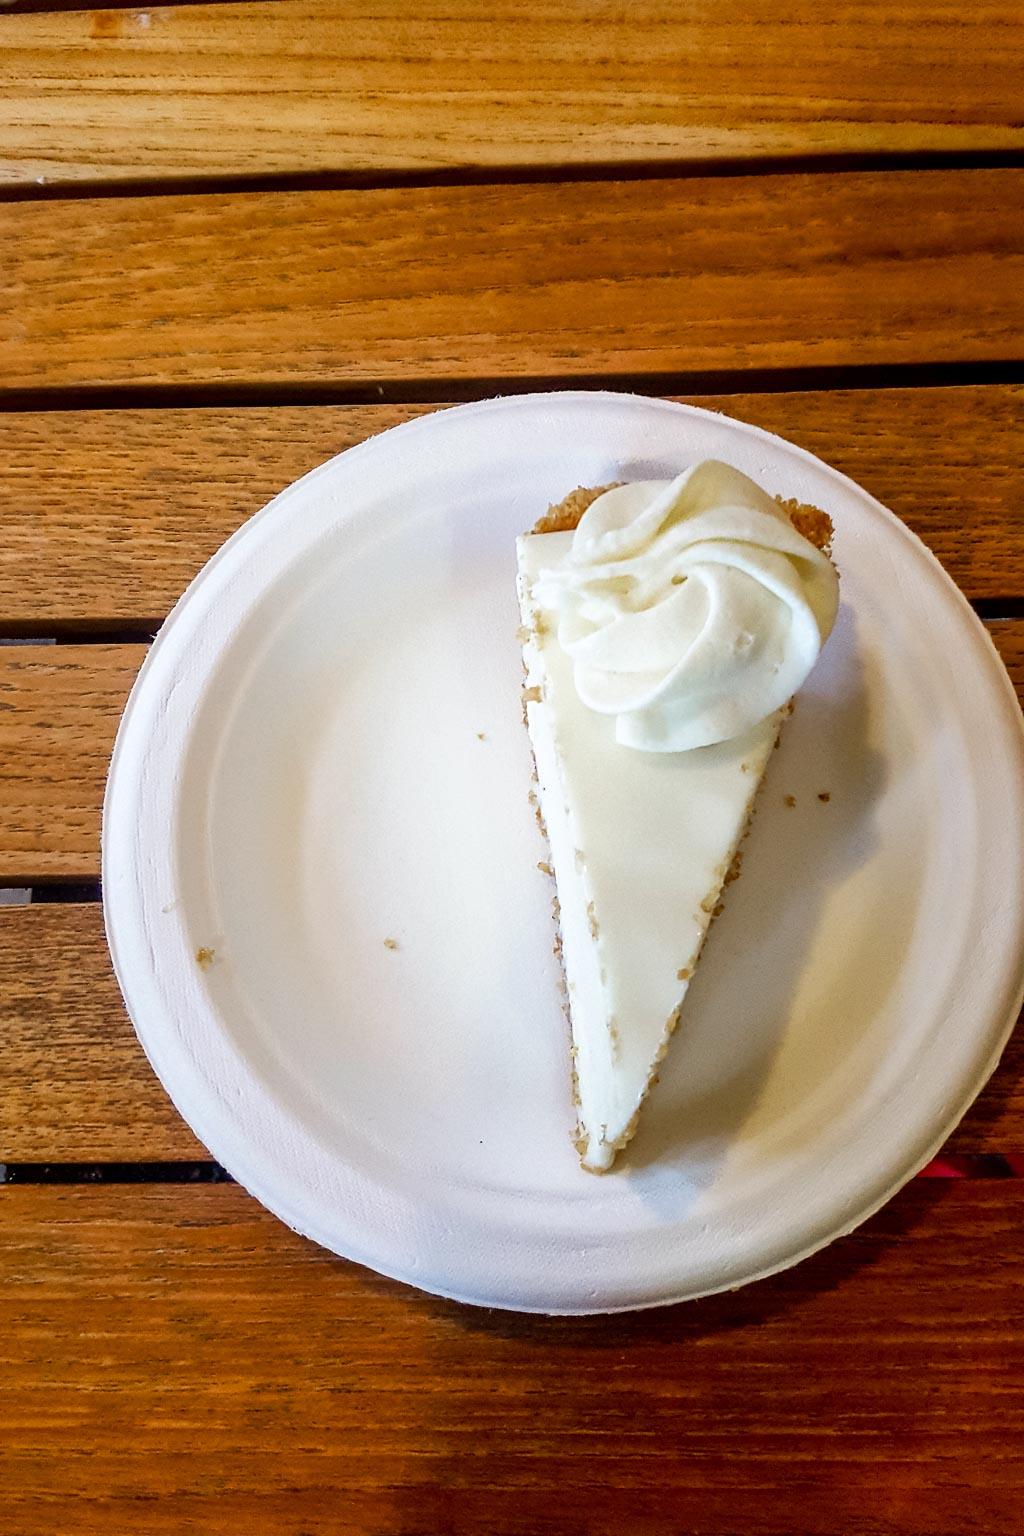 Key Lime Pie Company Florida Keys (c) Julia Hövelkamp